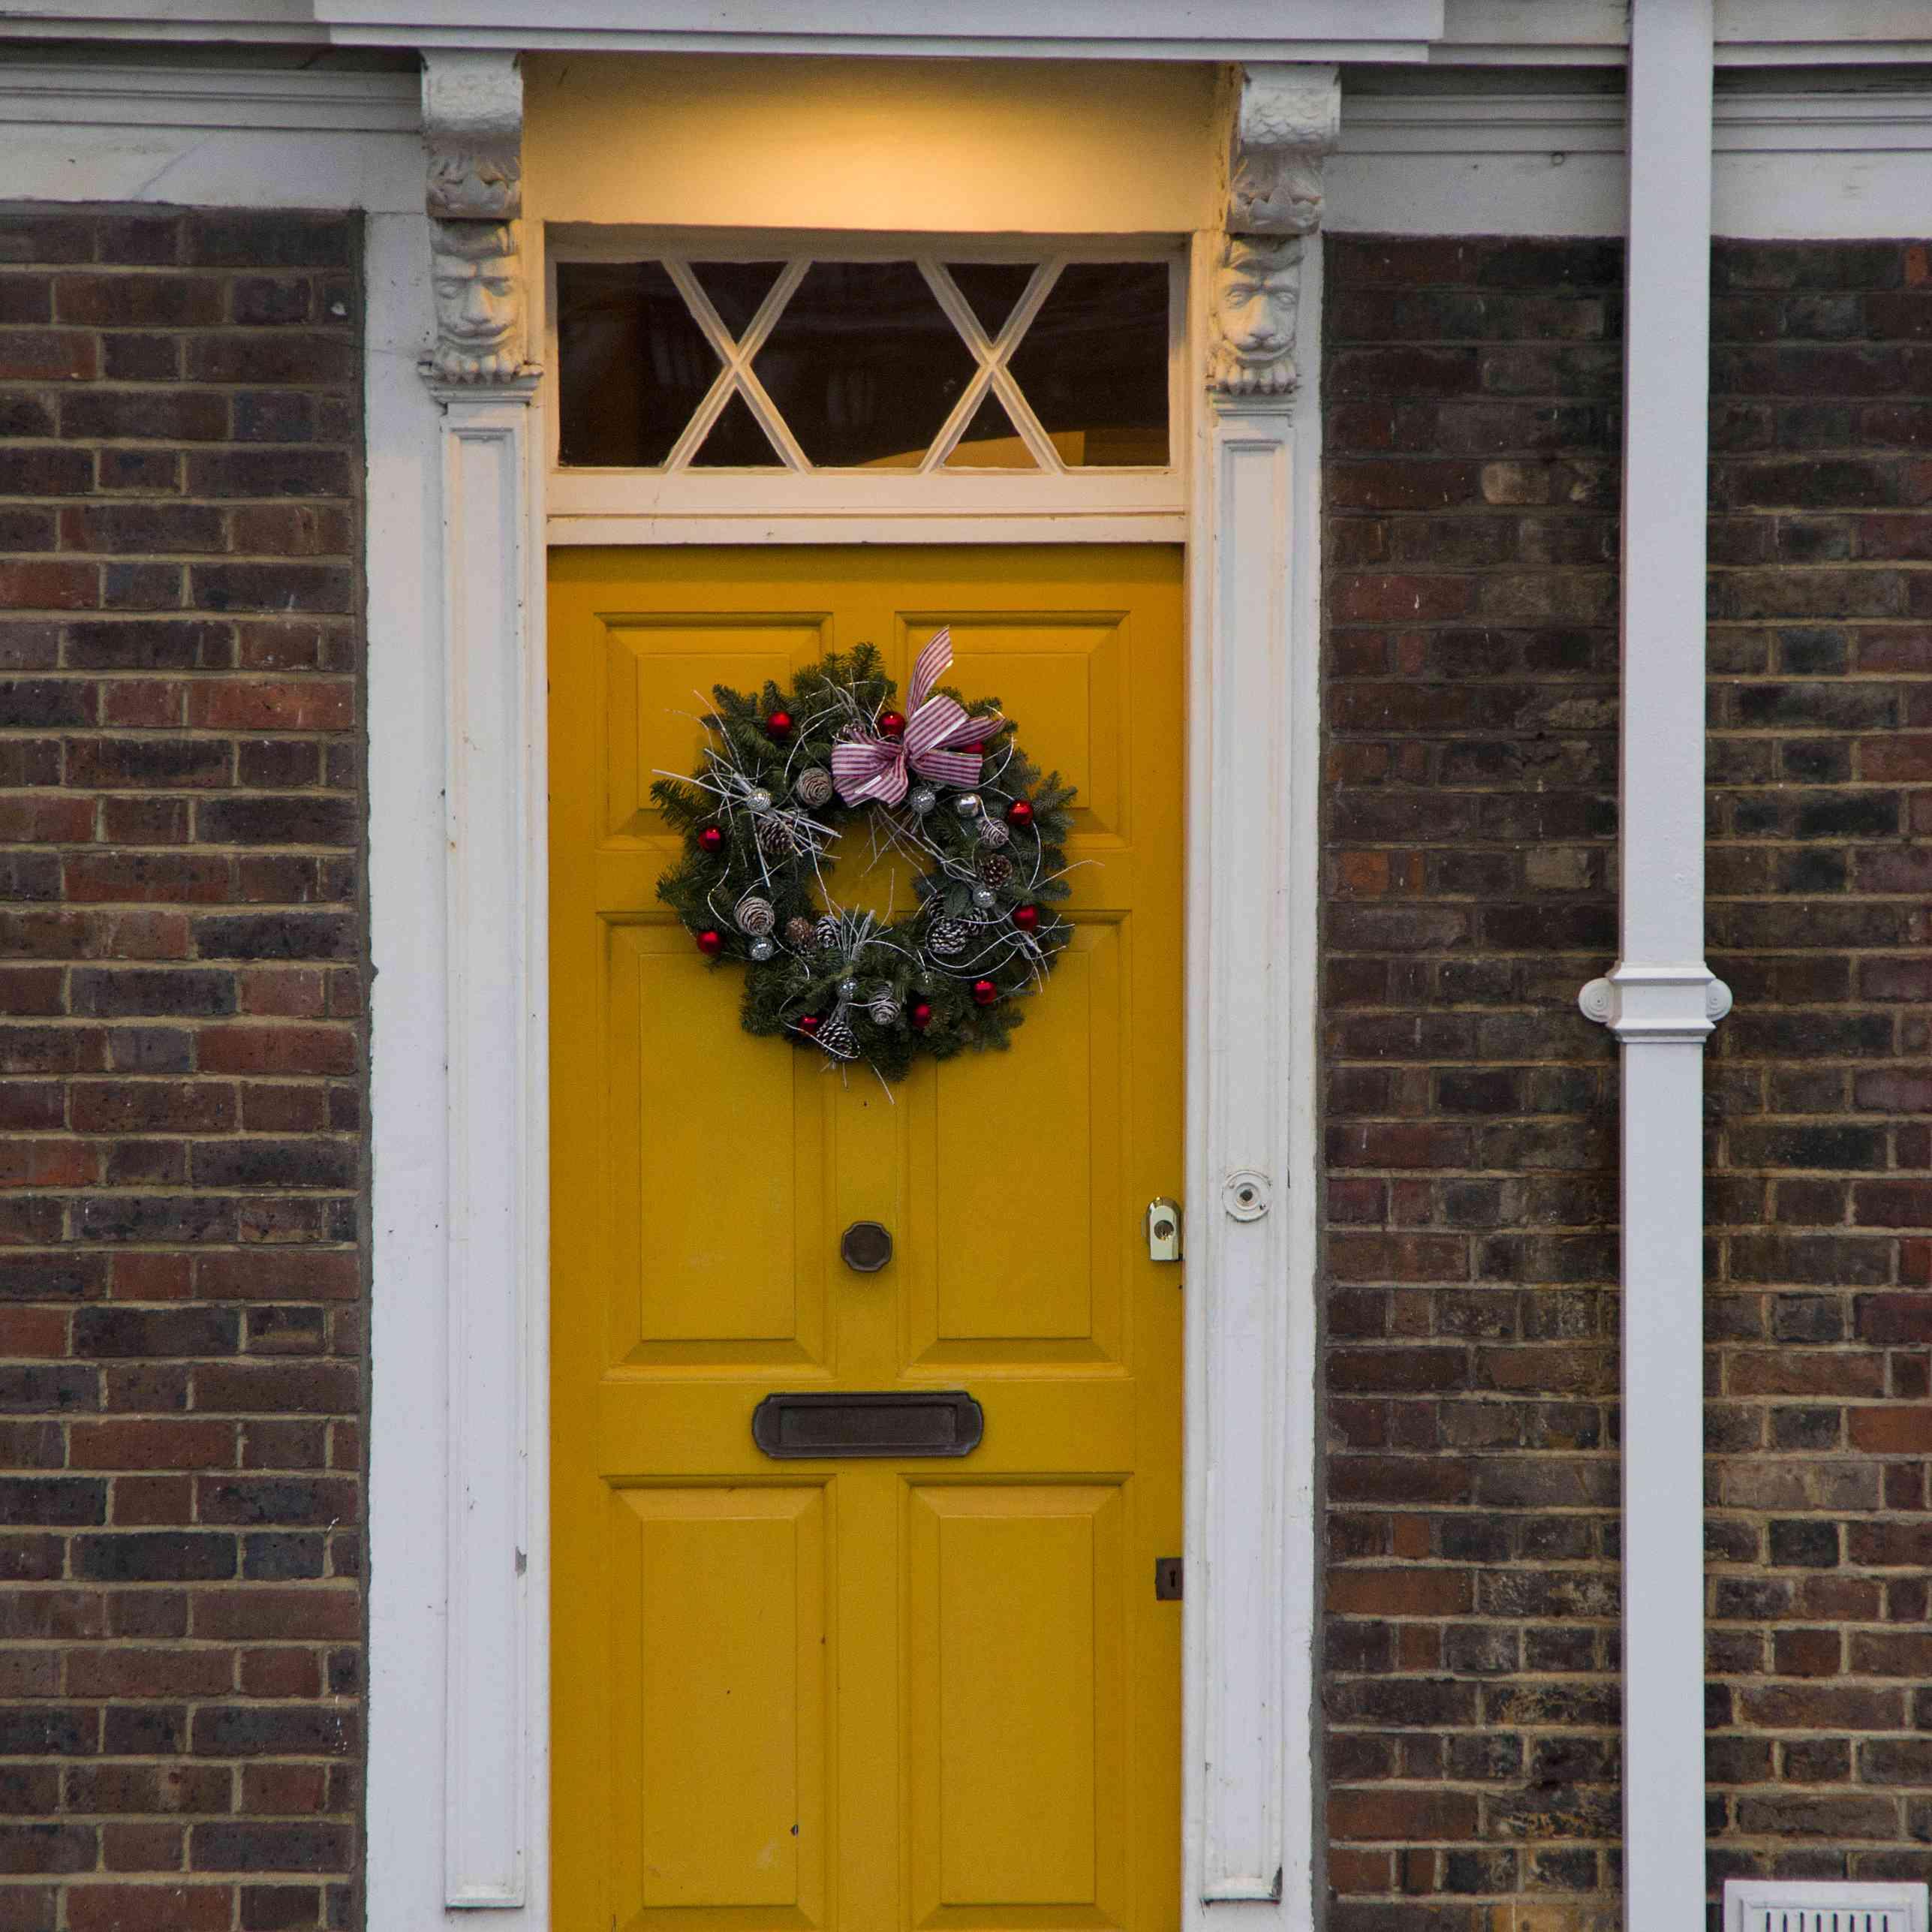 A warm orange-yellow door on a brick house with white trim